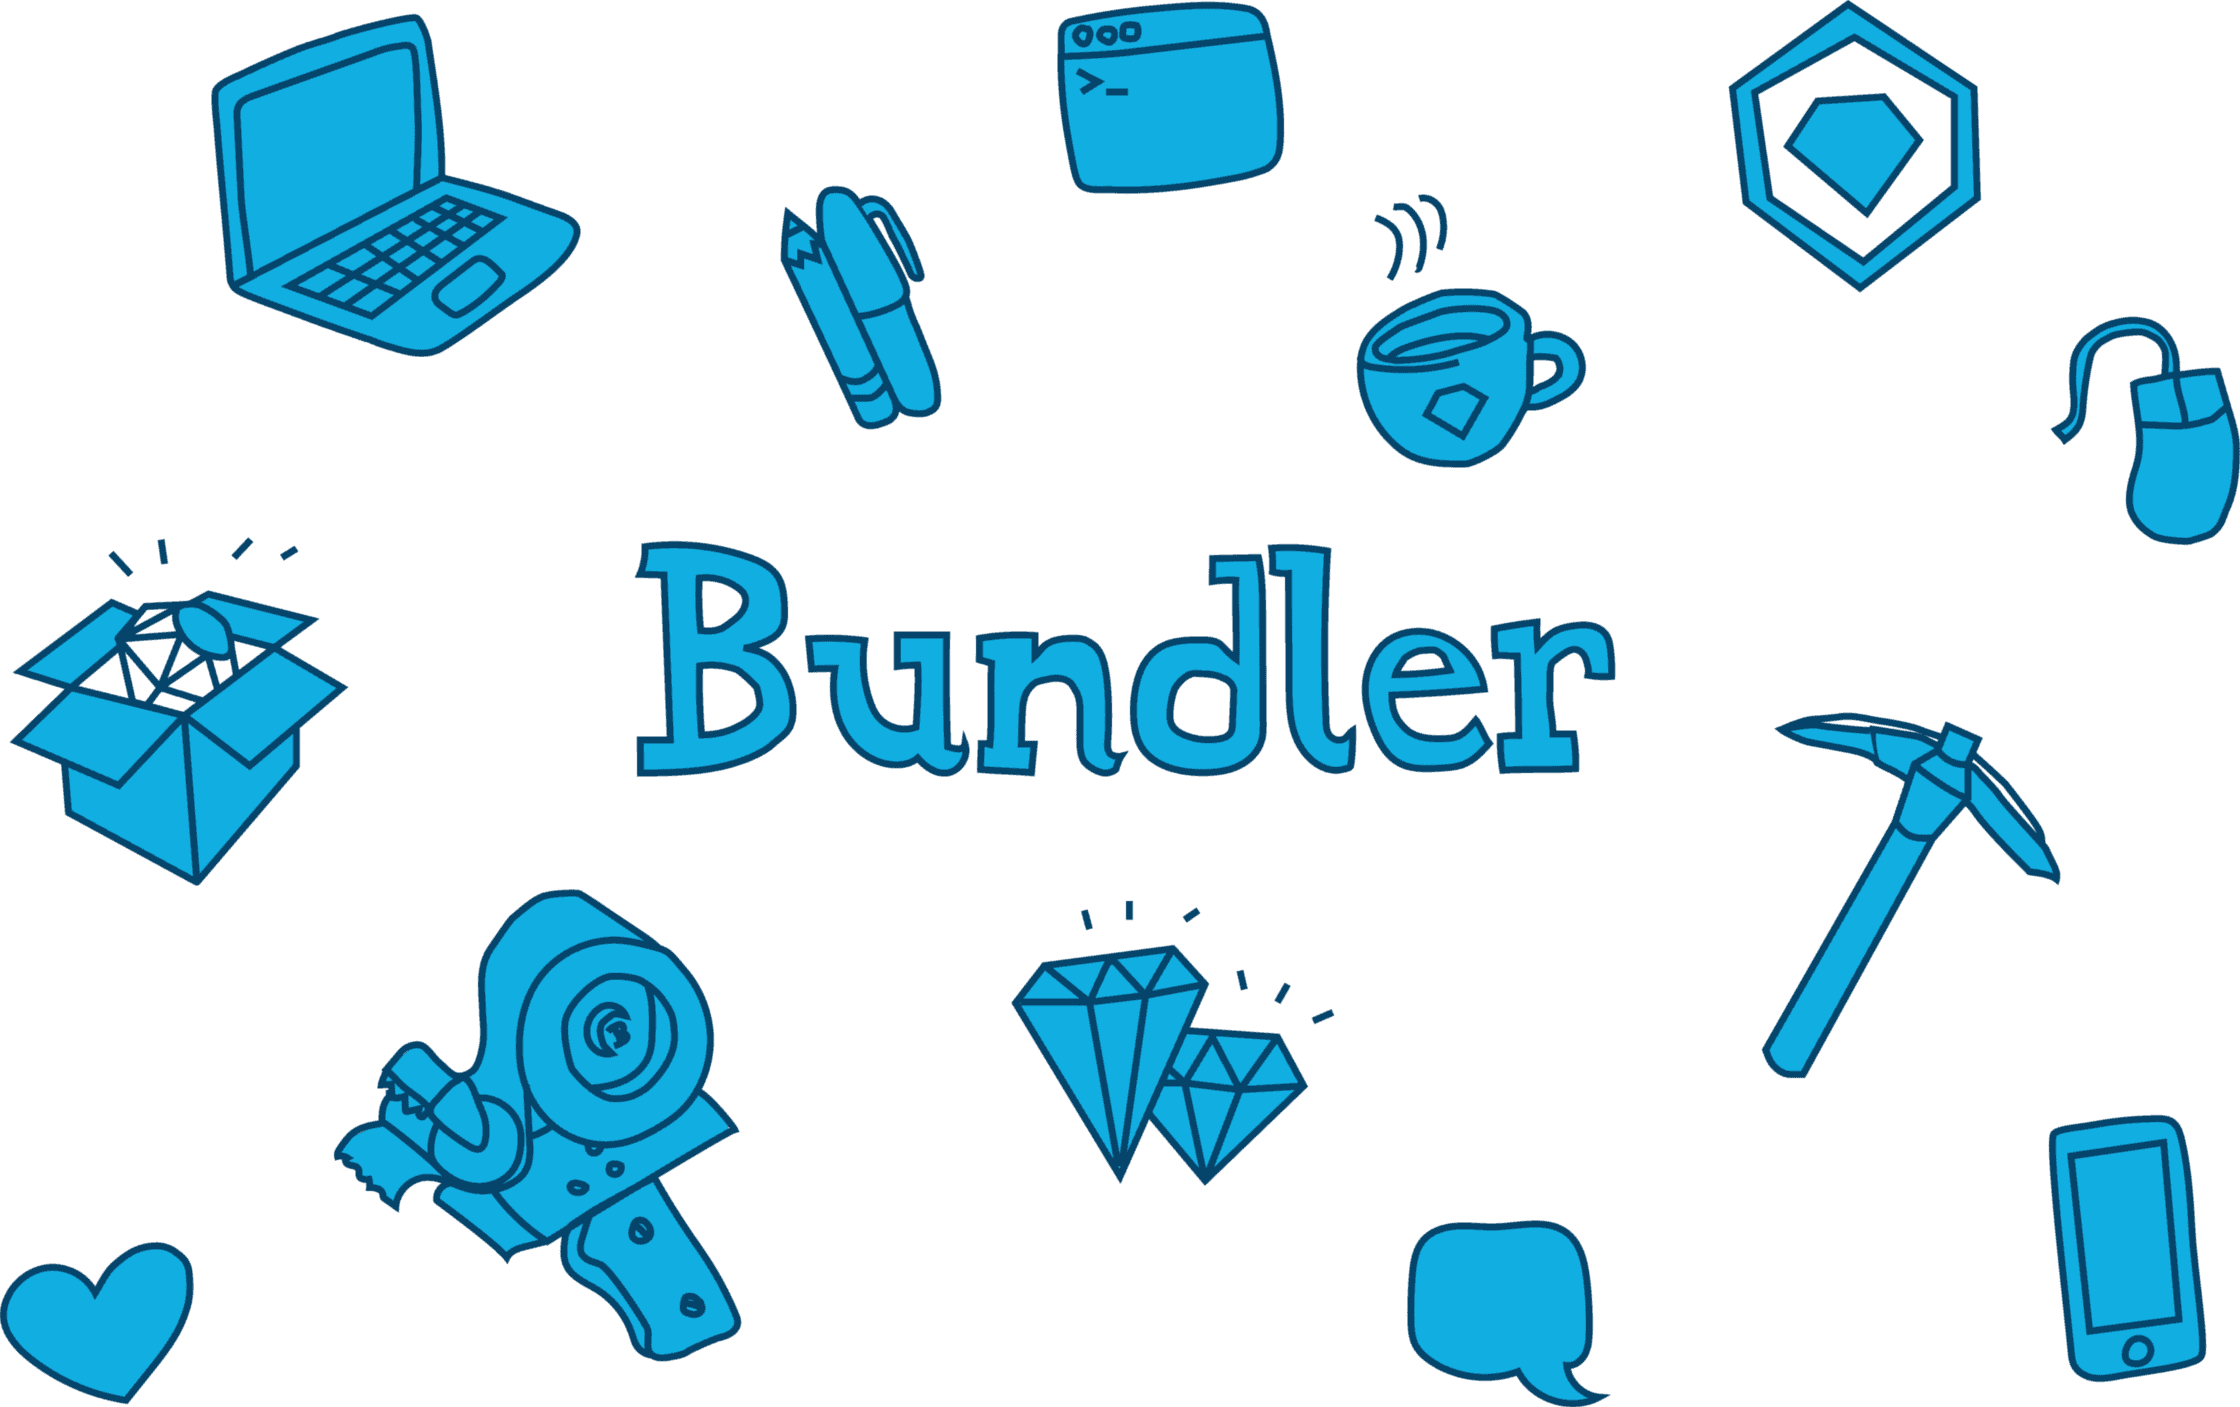 【Bundler】ロゴ